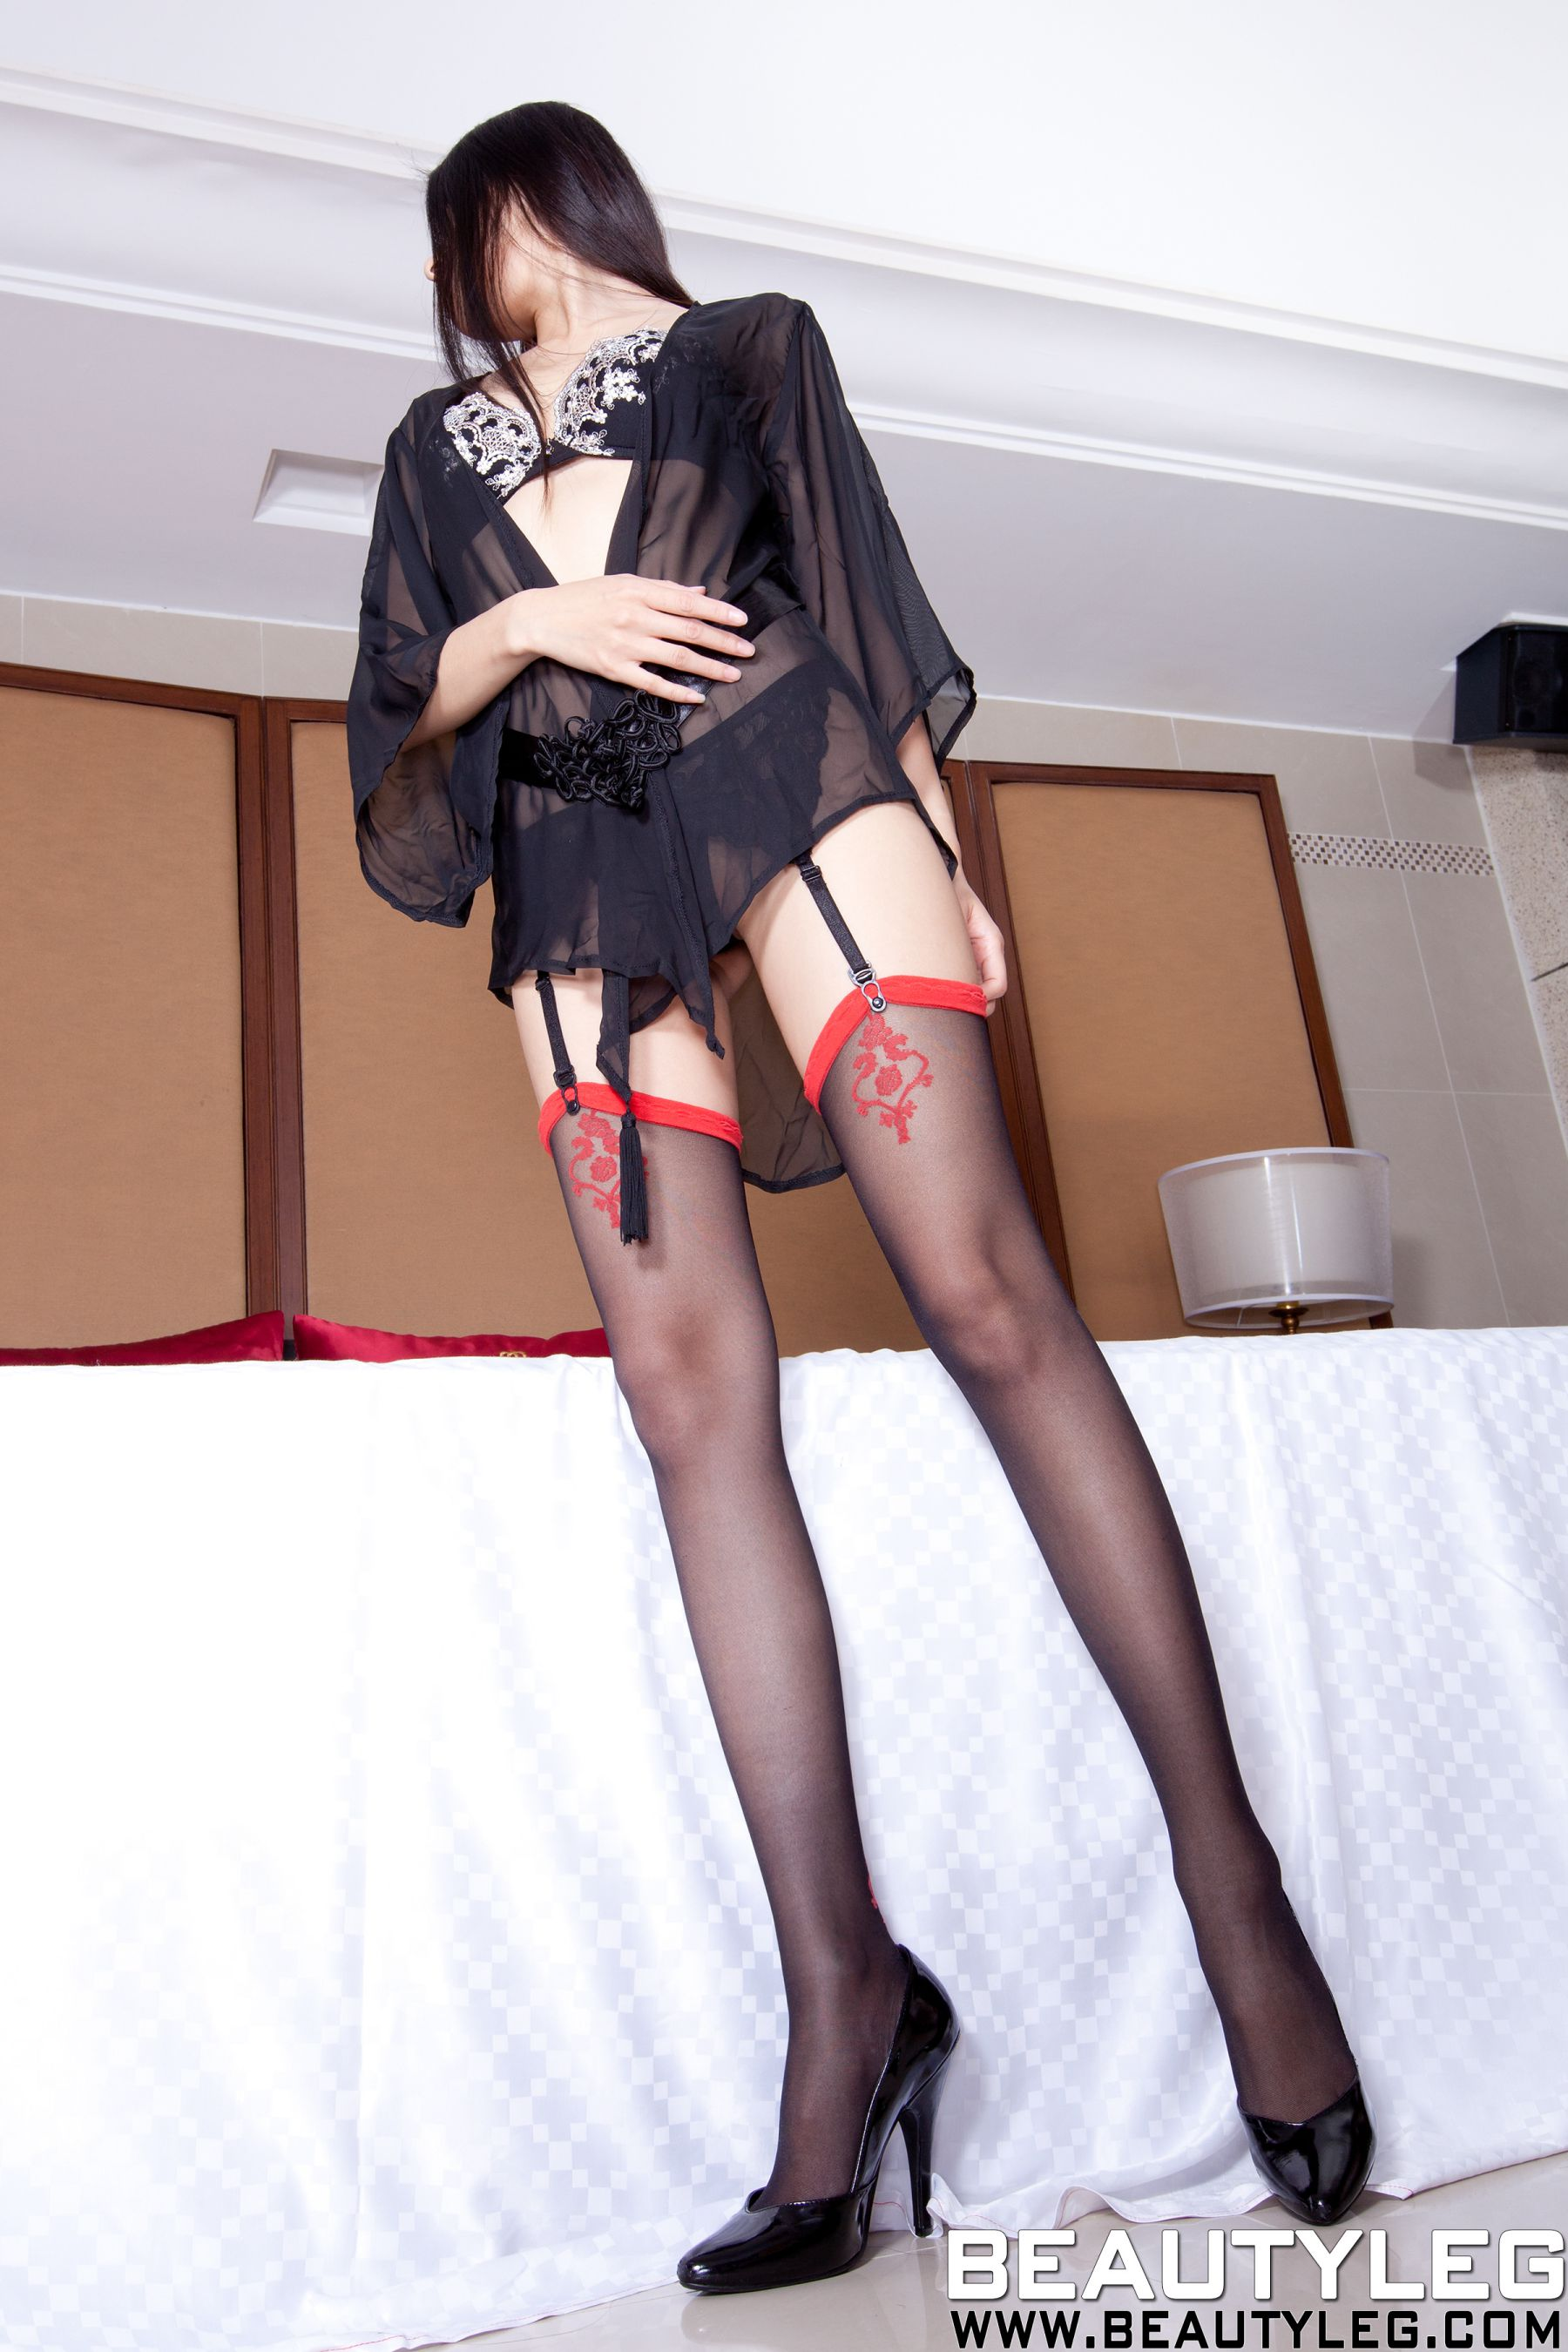 VOL.1677 [Beautyleg]美腿黑丝高跟透视美女吊带丝袜:腿模Linda高品质写真套图(57P)